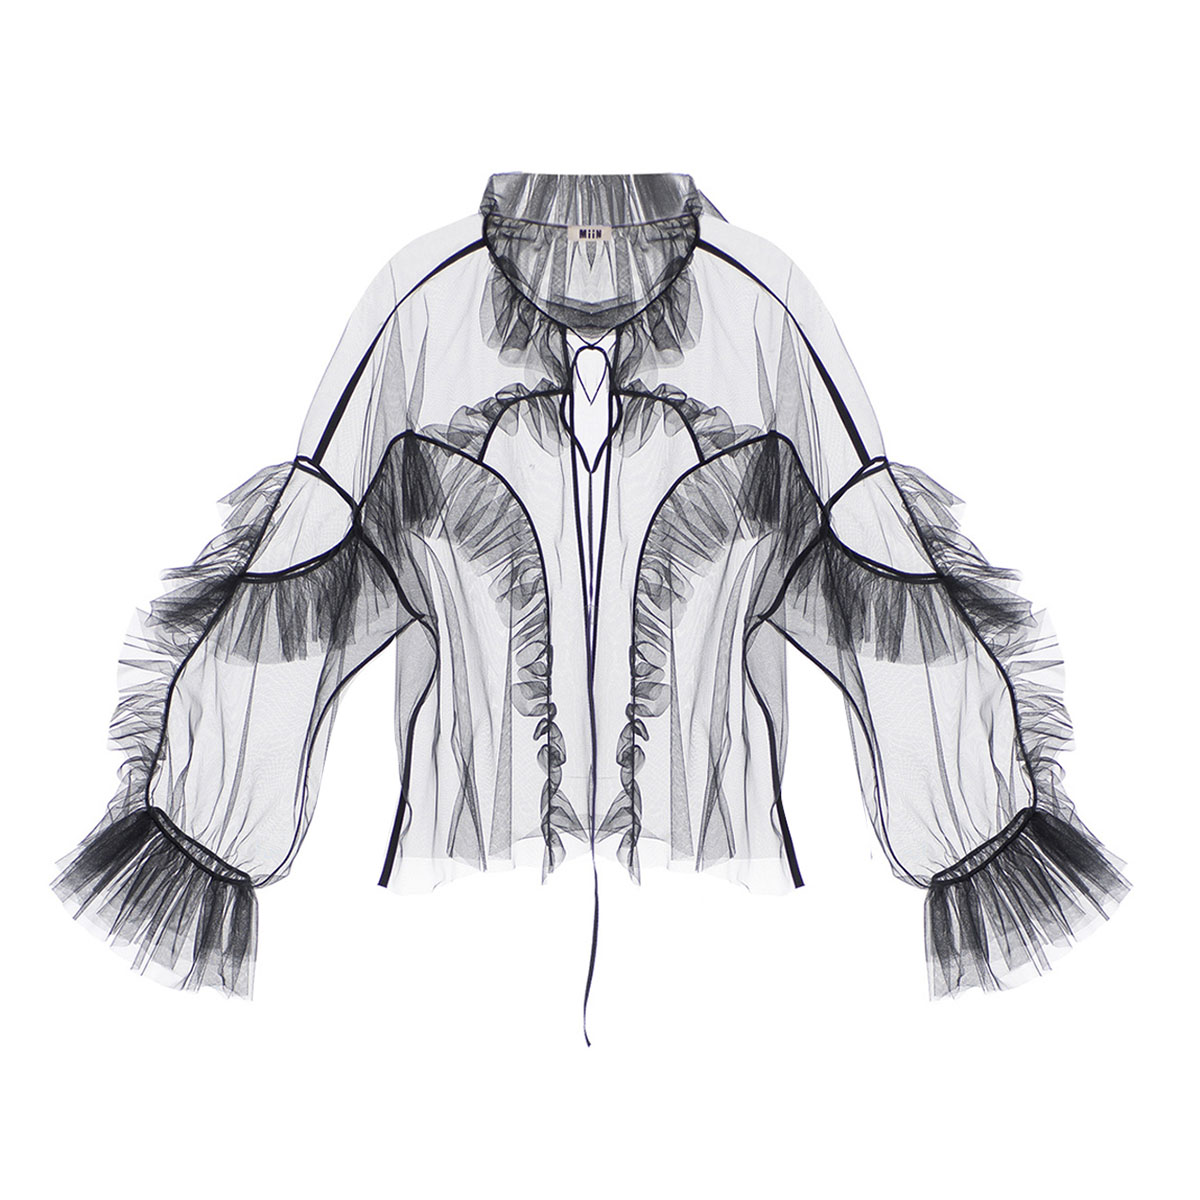 transparent-saydam-tekstil-dekupe-cekimi-_0002_Artboard-19 Transparent Dekupe Çekimi